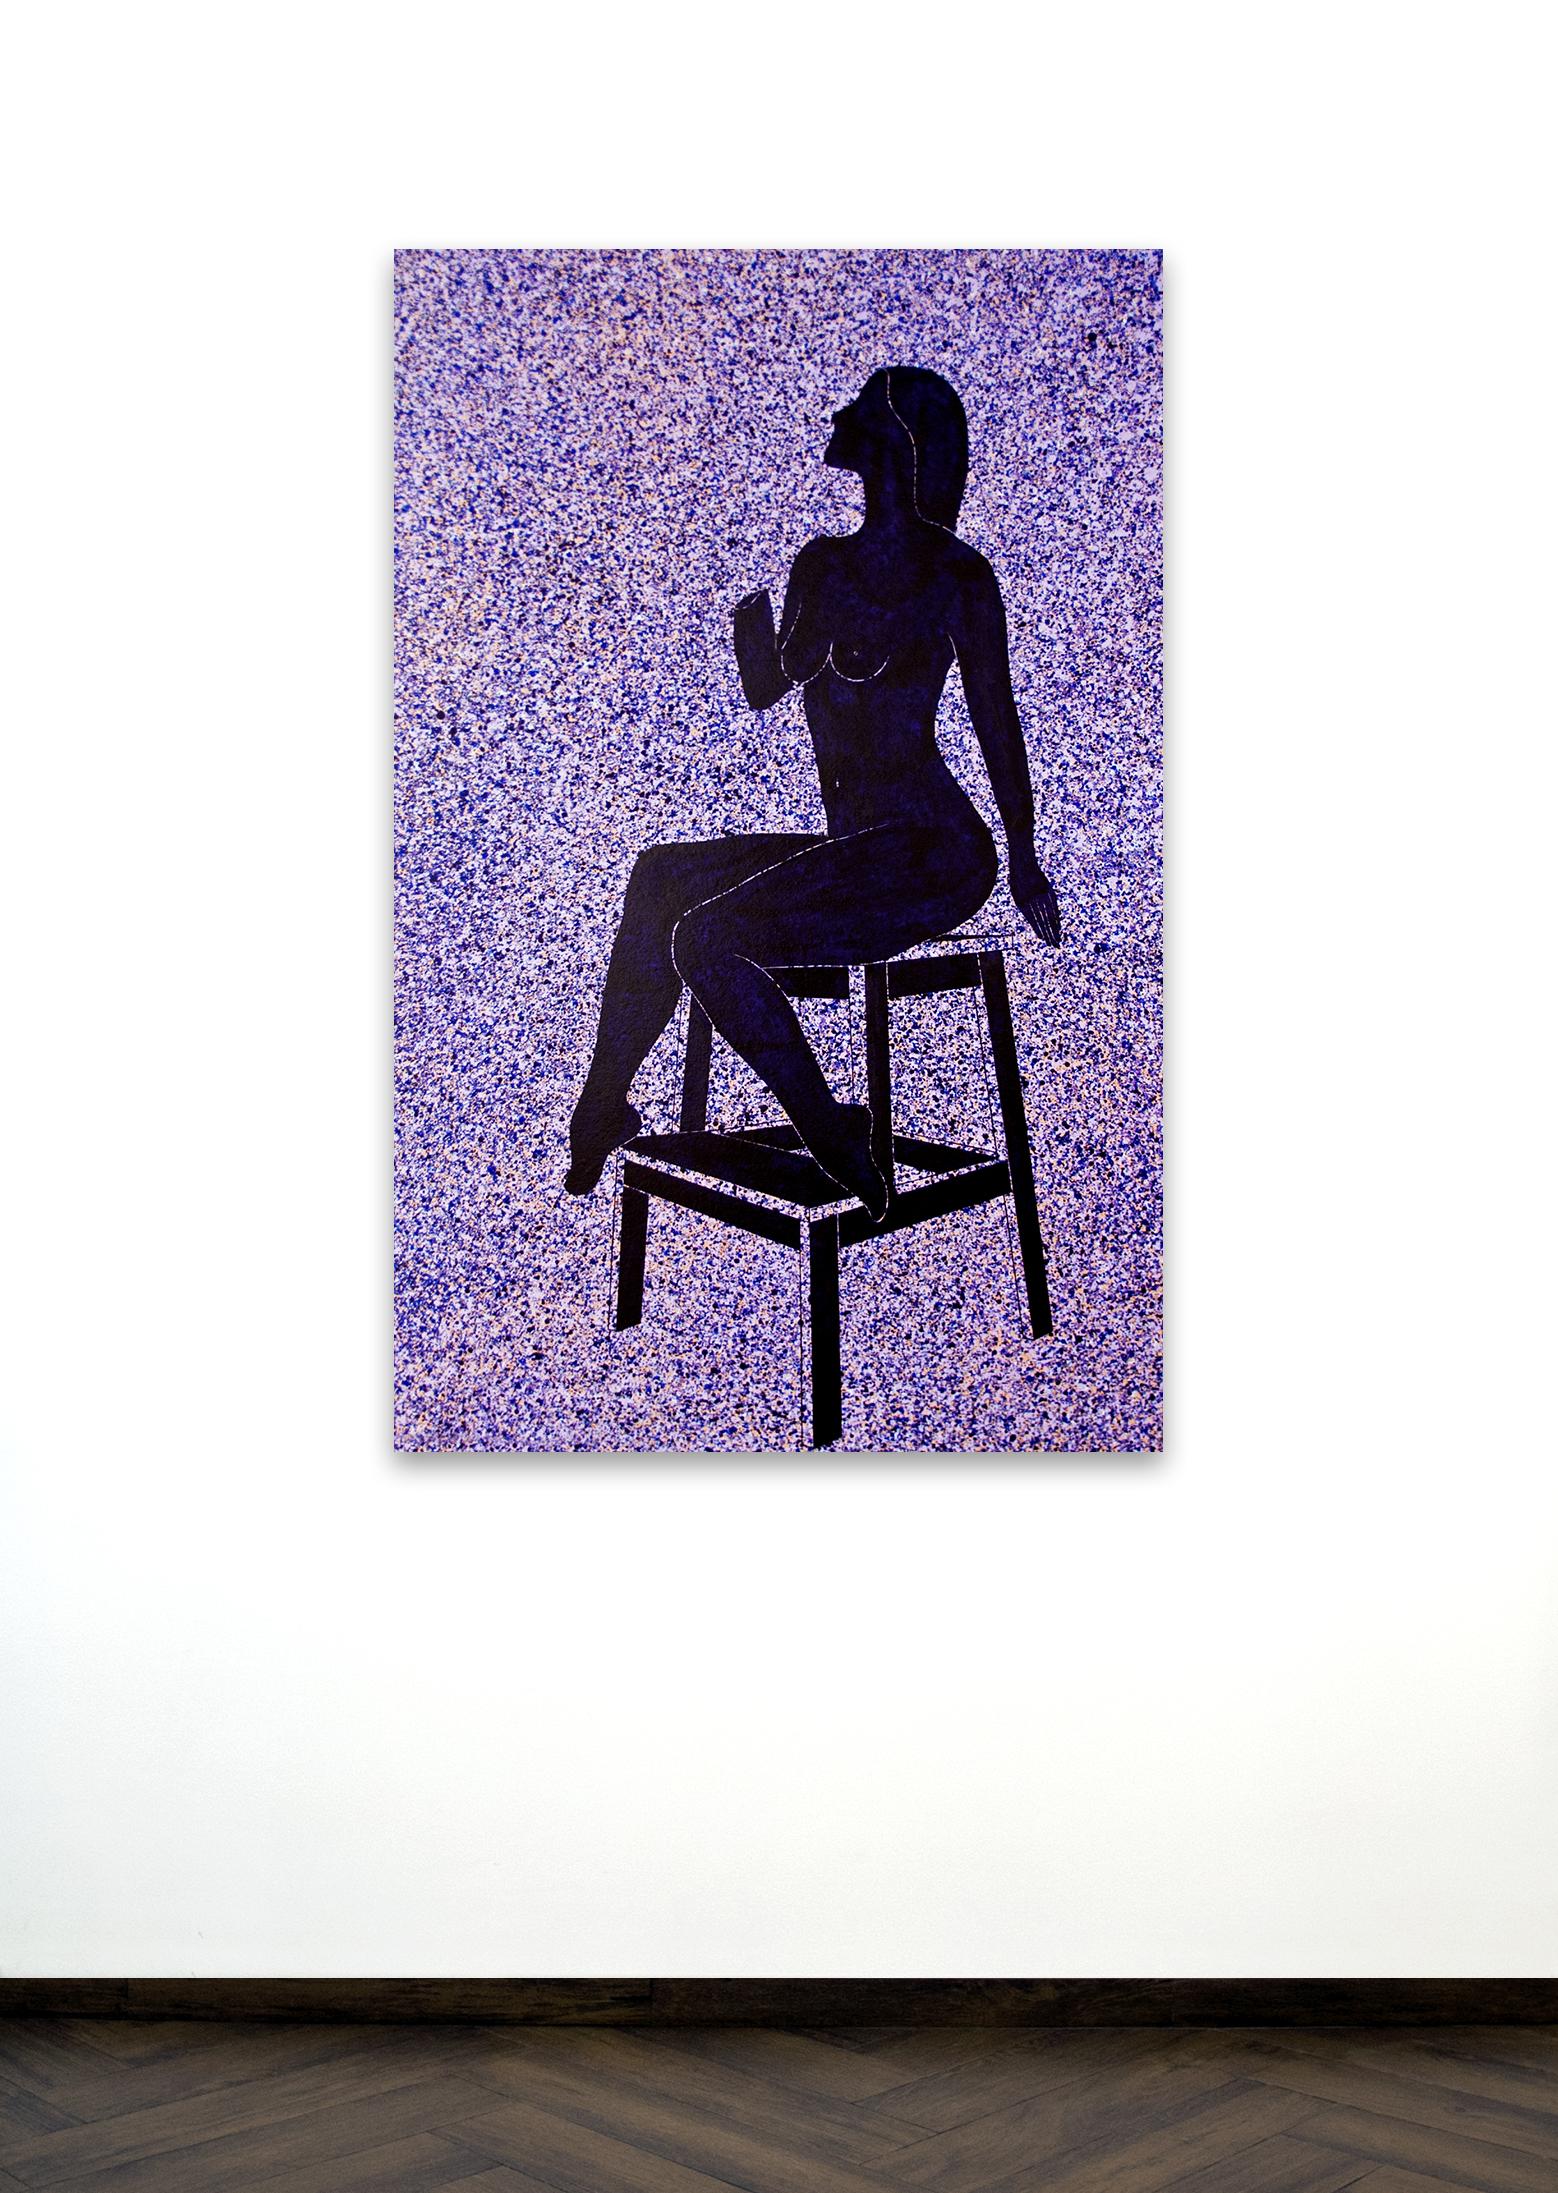 Skoya Assémat-Tessandier, Sleeping Beauty °II, 2014 140cm x 90cm, Acrylic on canvas, wooden stretchers.